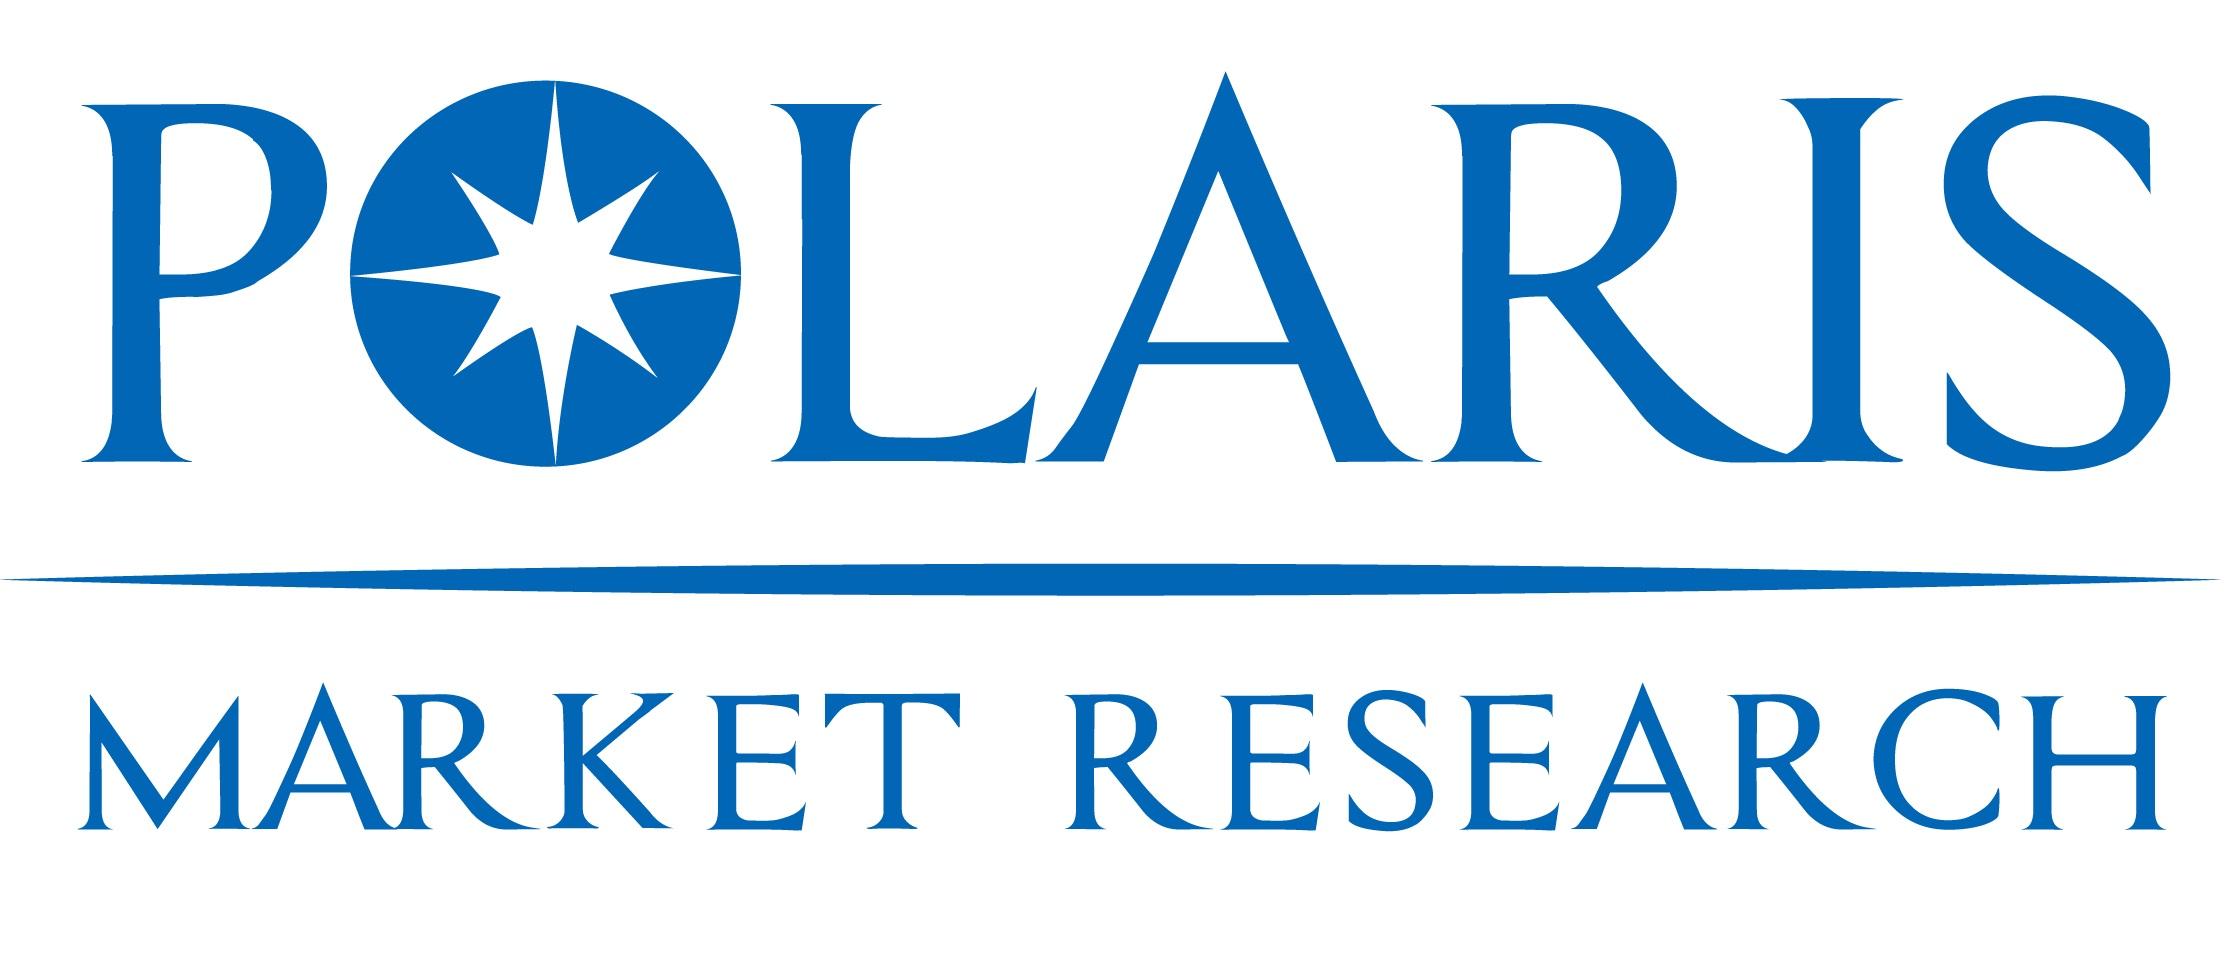 Lactase Market Size Estimated to Reach $289.1 Million By 2028 | Prominent Players: Mitushi Biopharma, Ltd., Dupont, Antozyme Biotech, Advanced Enzyme Technologies, Novact Corp, Aumgene Biosciences